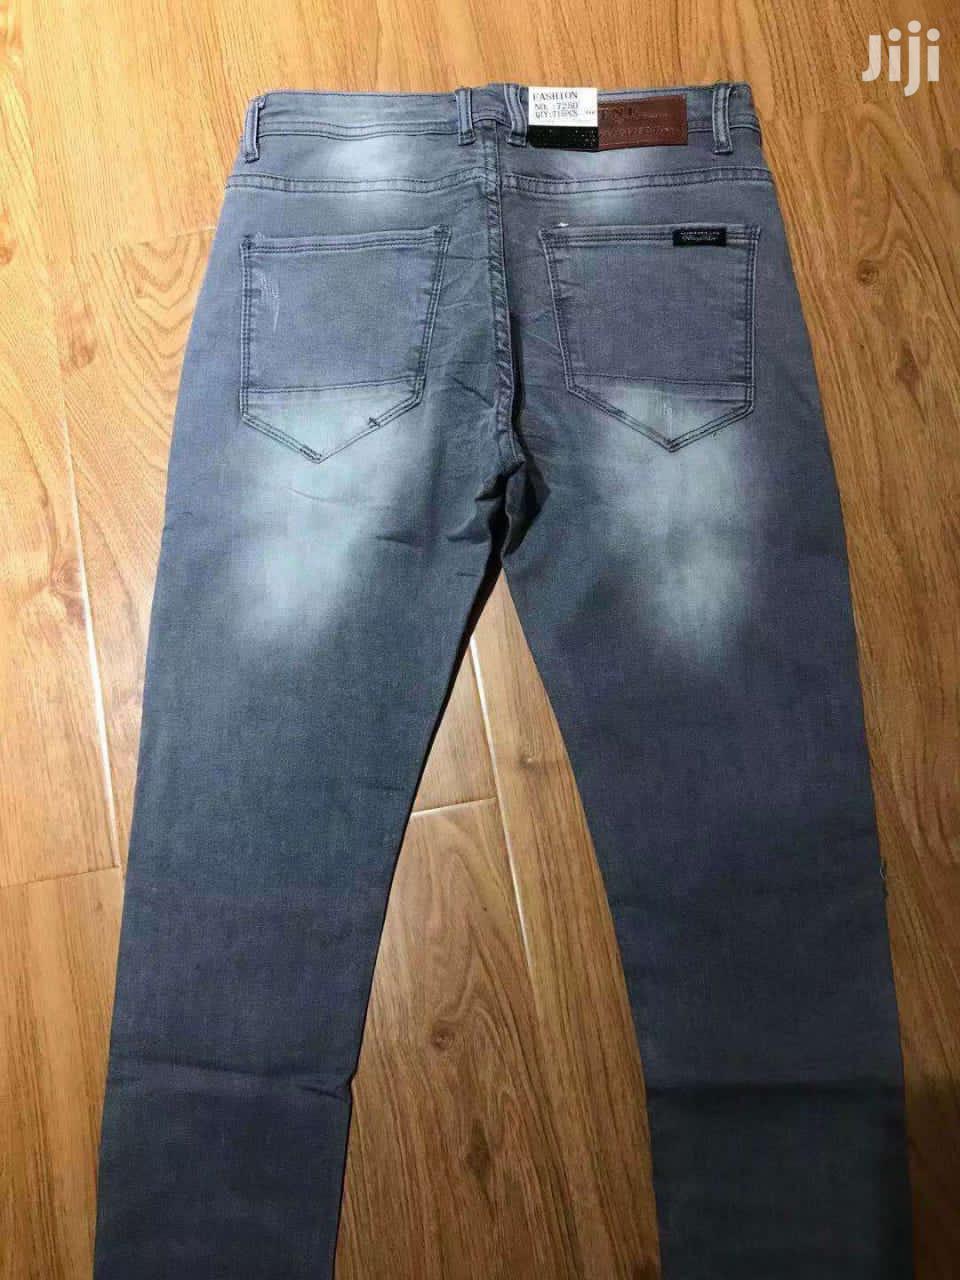 Jeans Available All Sizes Designer | Clothing for sale in Nairobi Central, Nairobi, Kenya